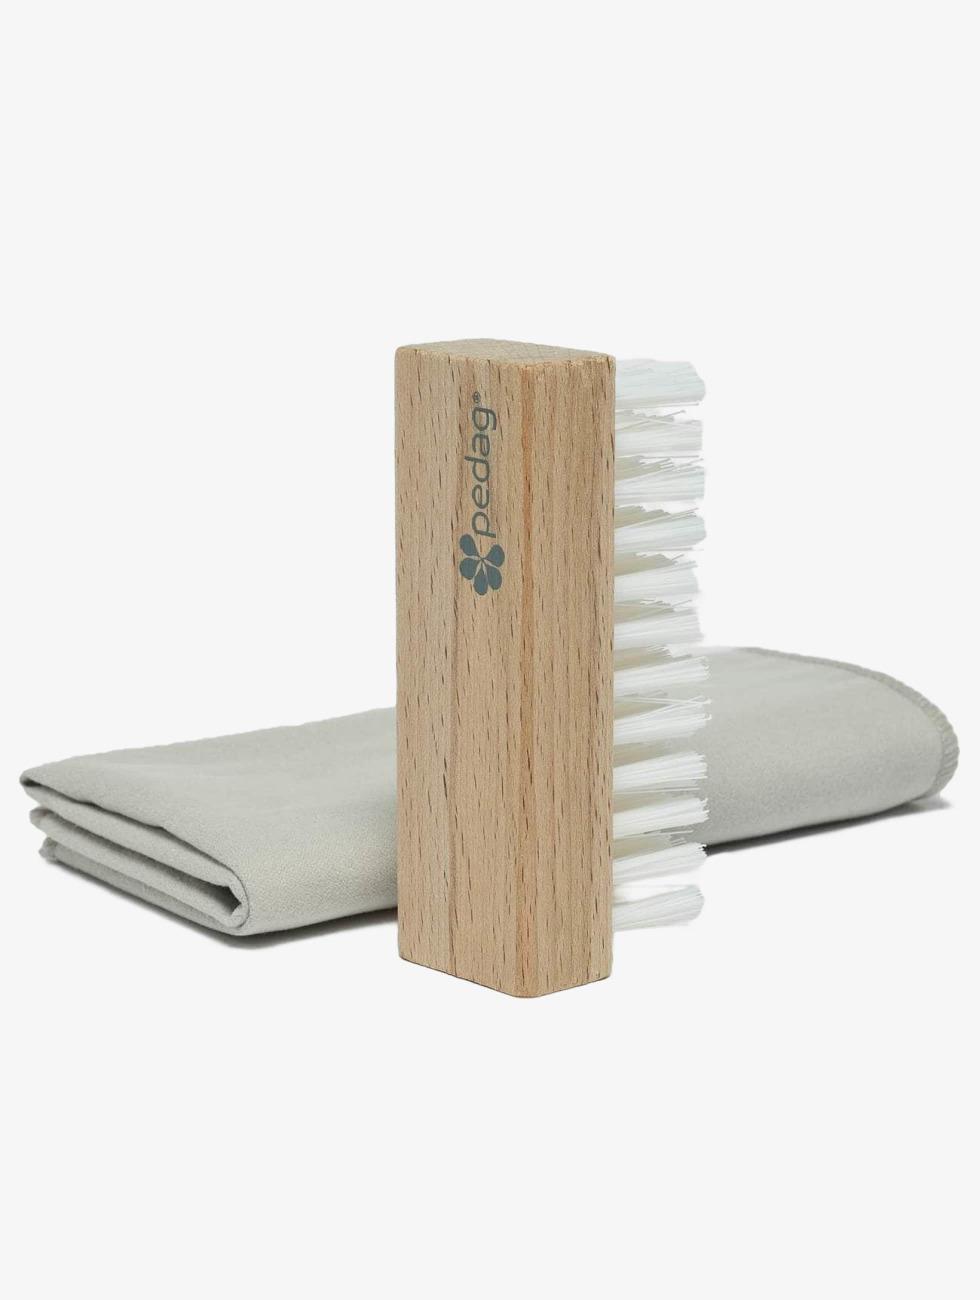 Pedag Shoe Care Cleansing Kit Brush & Microfiber colored